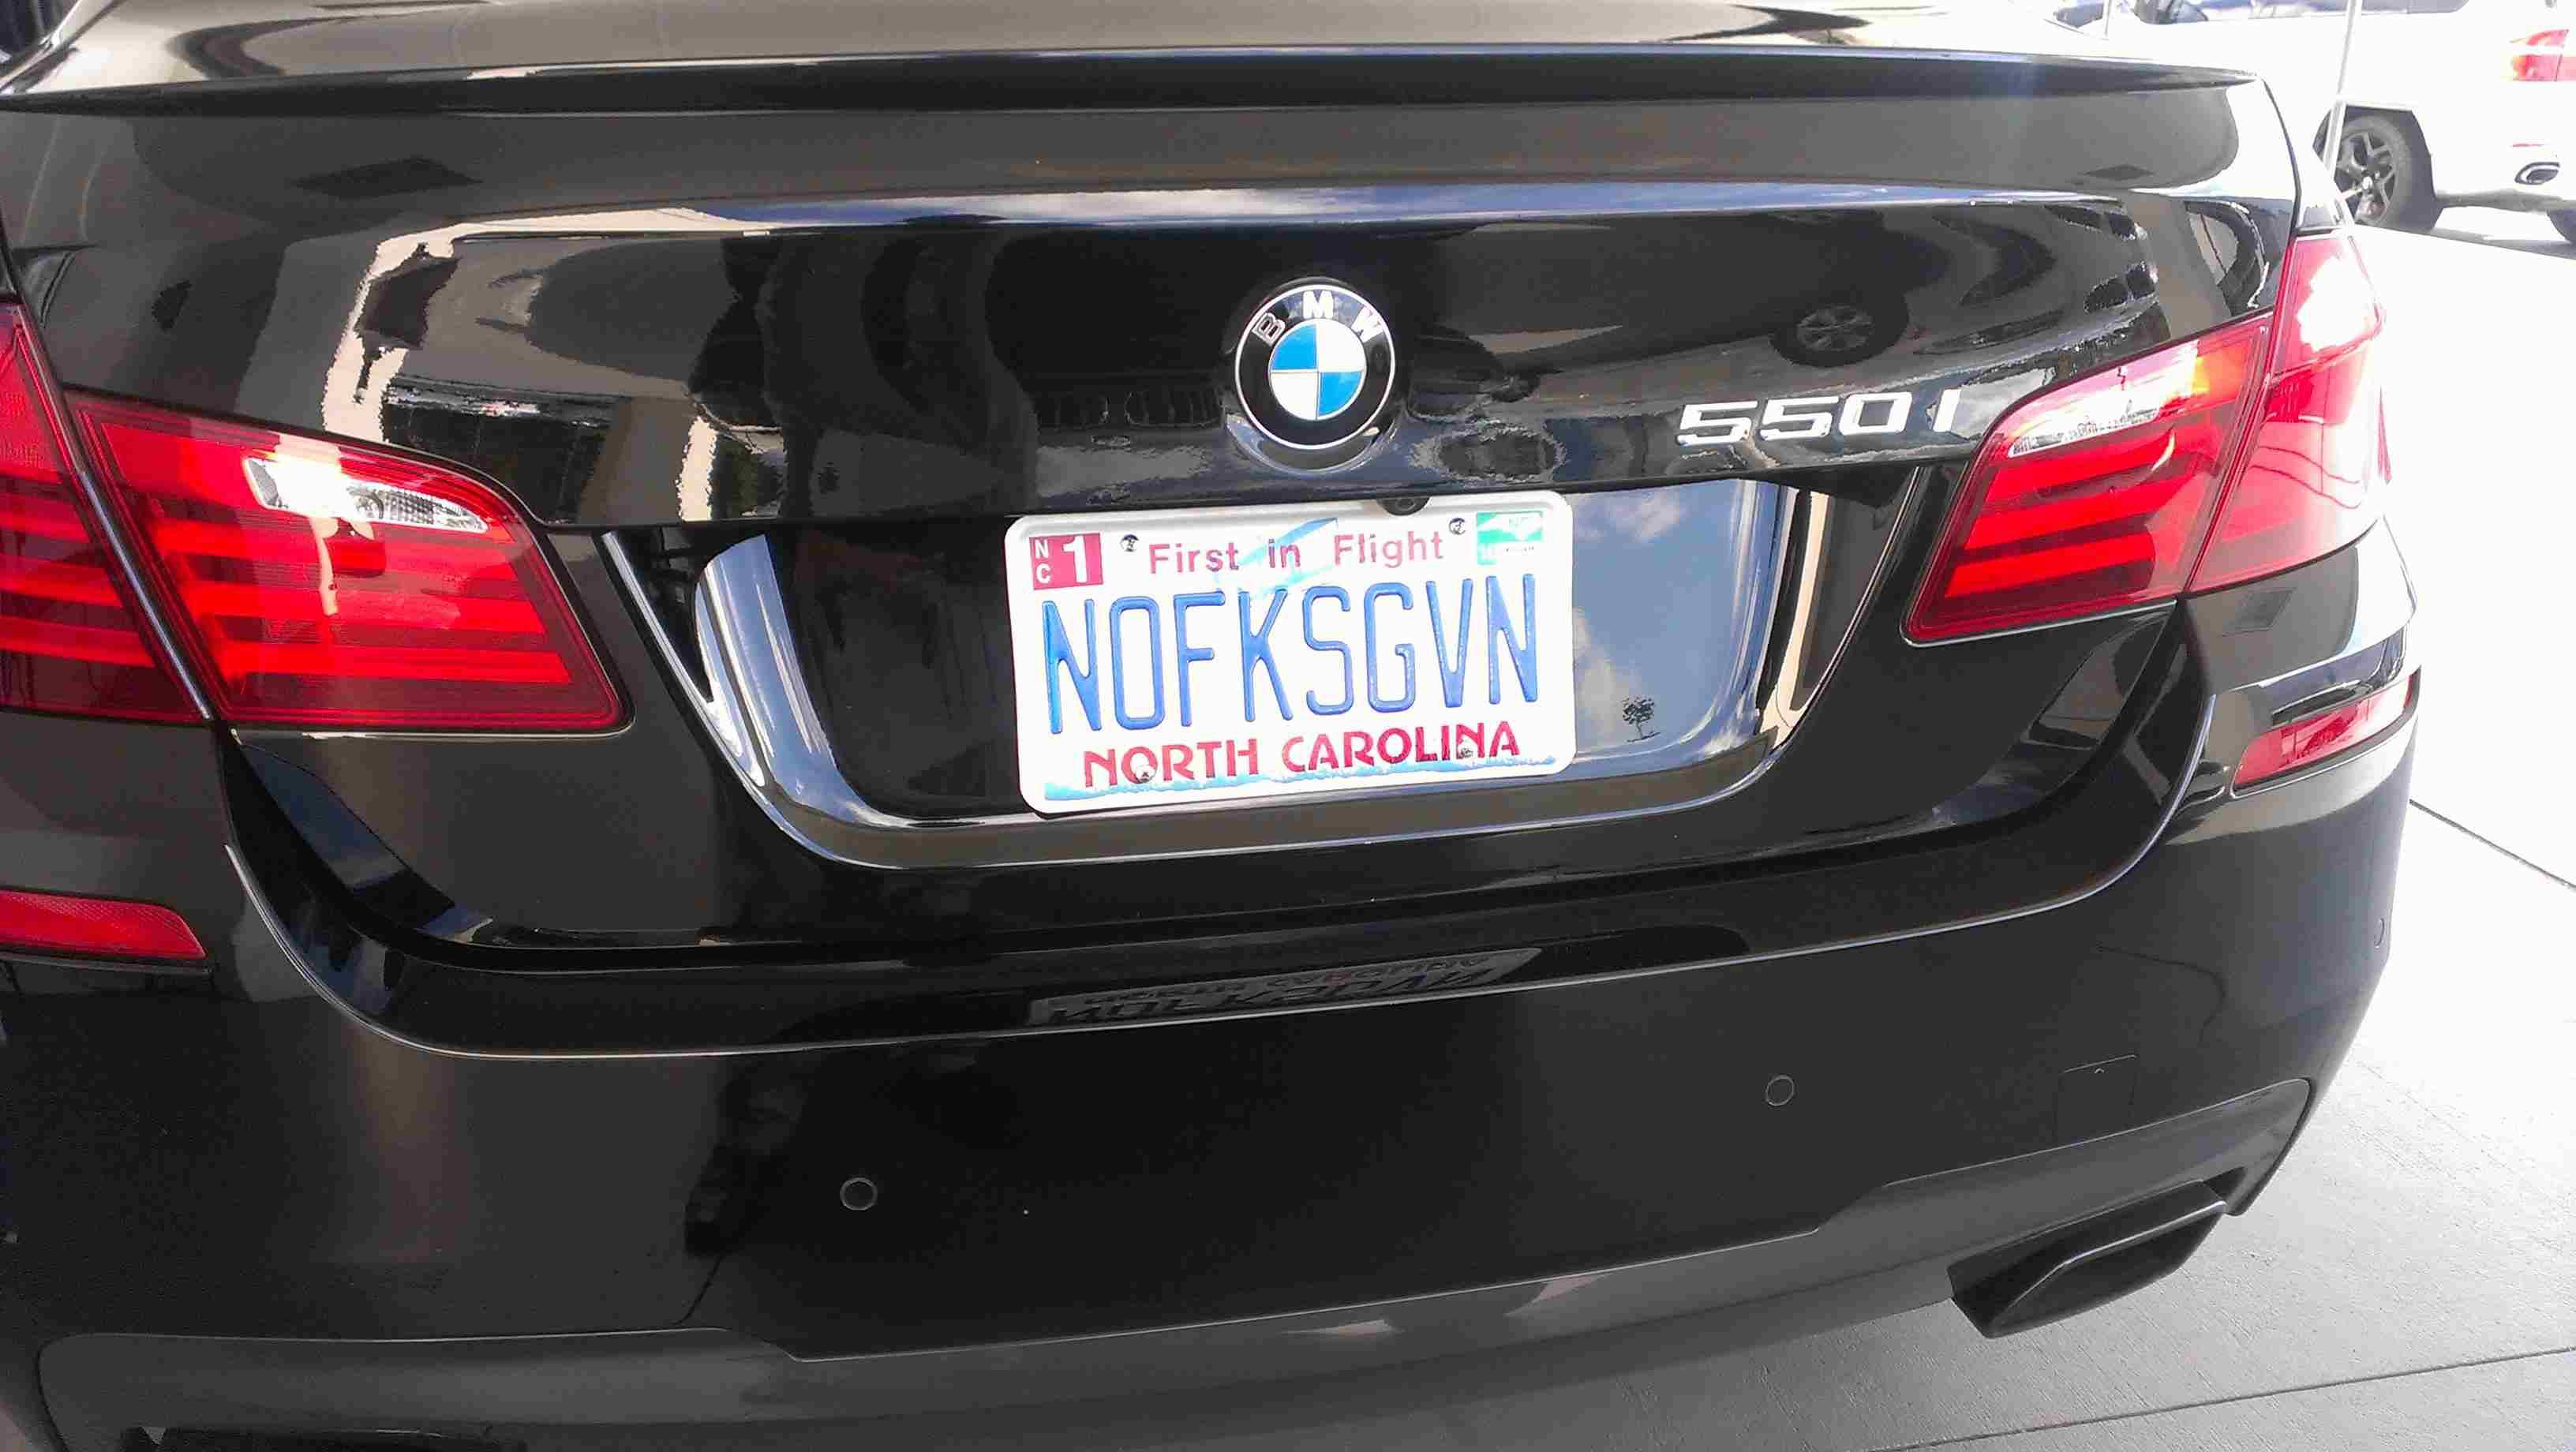 No fucks given license plates